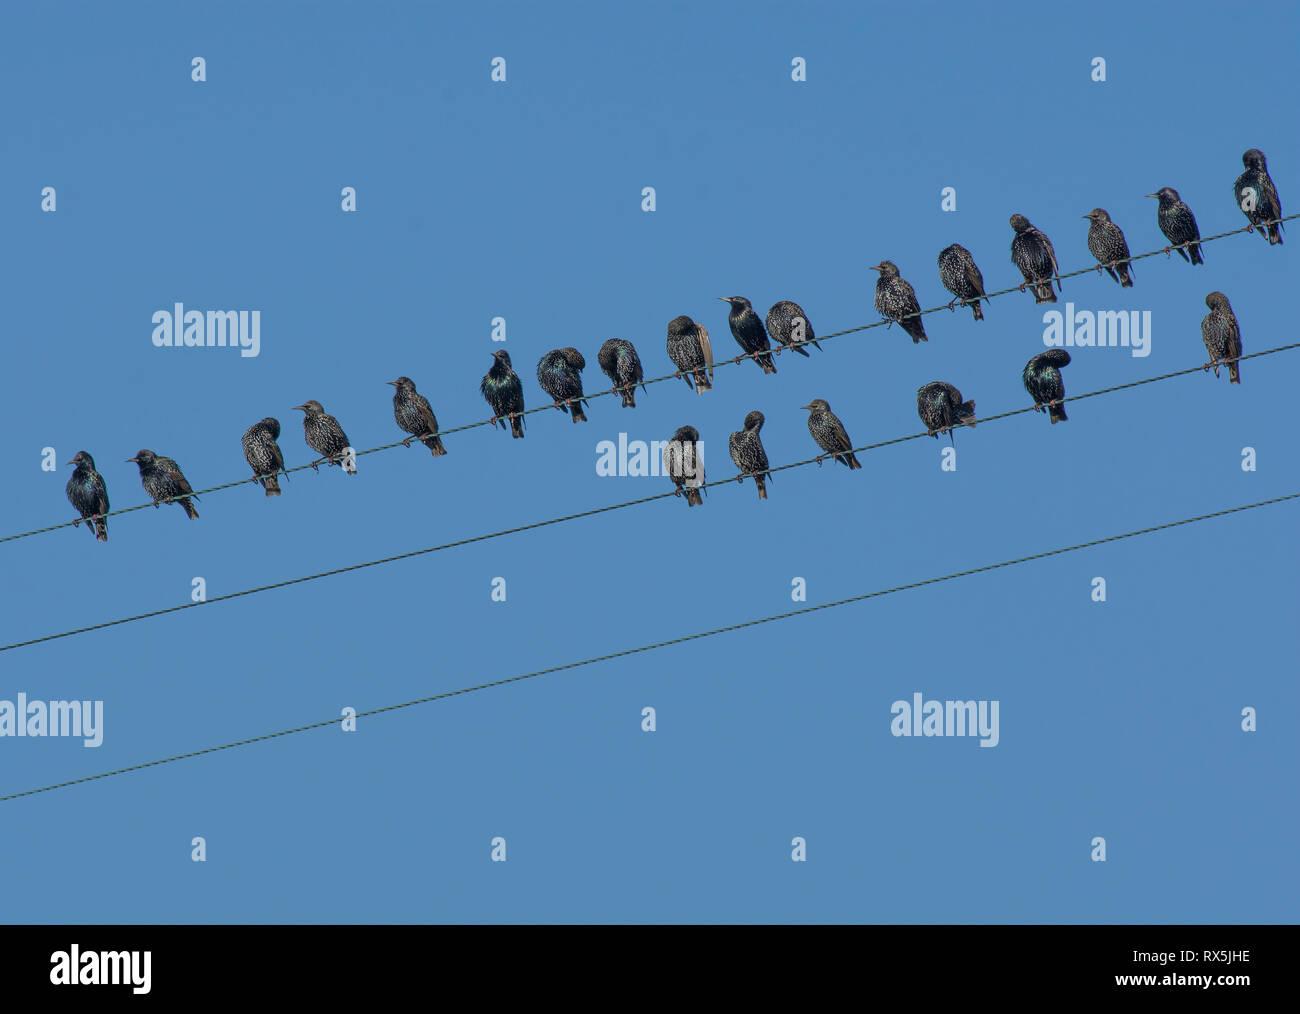 common starlings / european starling, sturnus vulgaris, flock congregating  on telephone wire, lancashire, uk